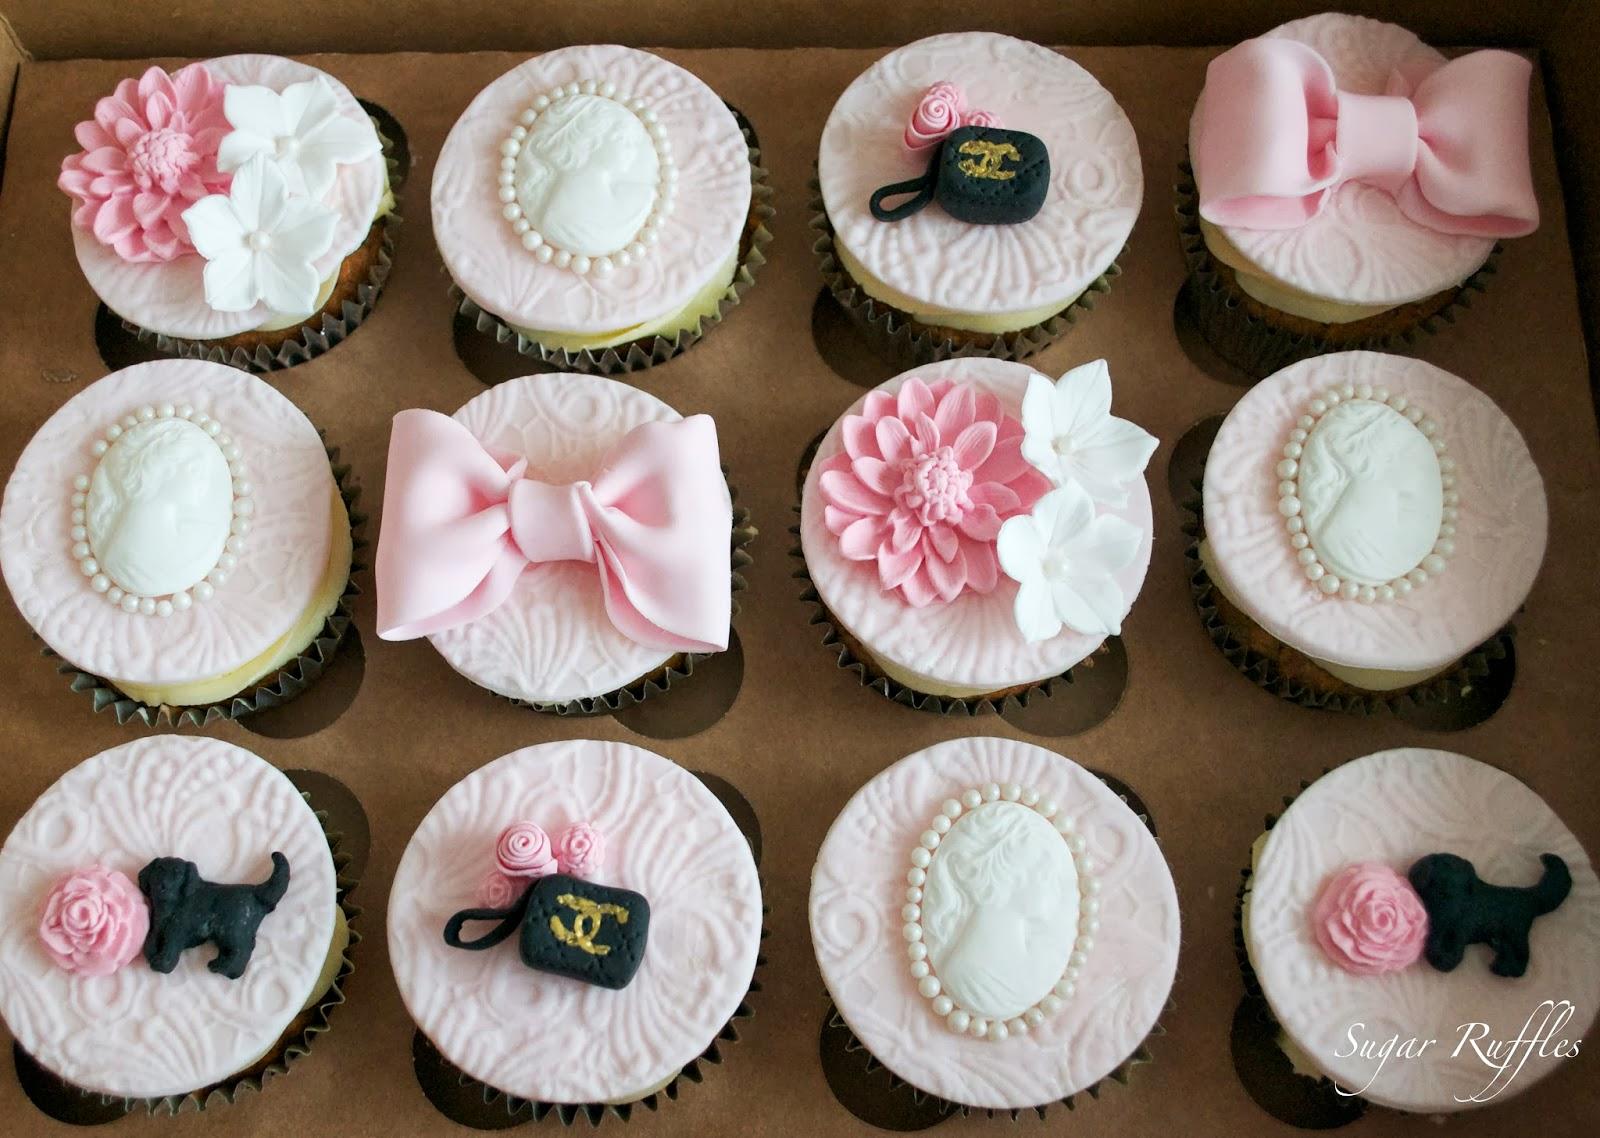 Cupcake Decorating Ideas 21st Birthday : Sugar Ruffles, Elegant Wedding Cakes. Barrow in Furness ...